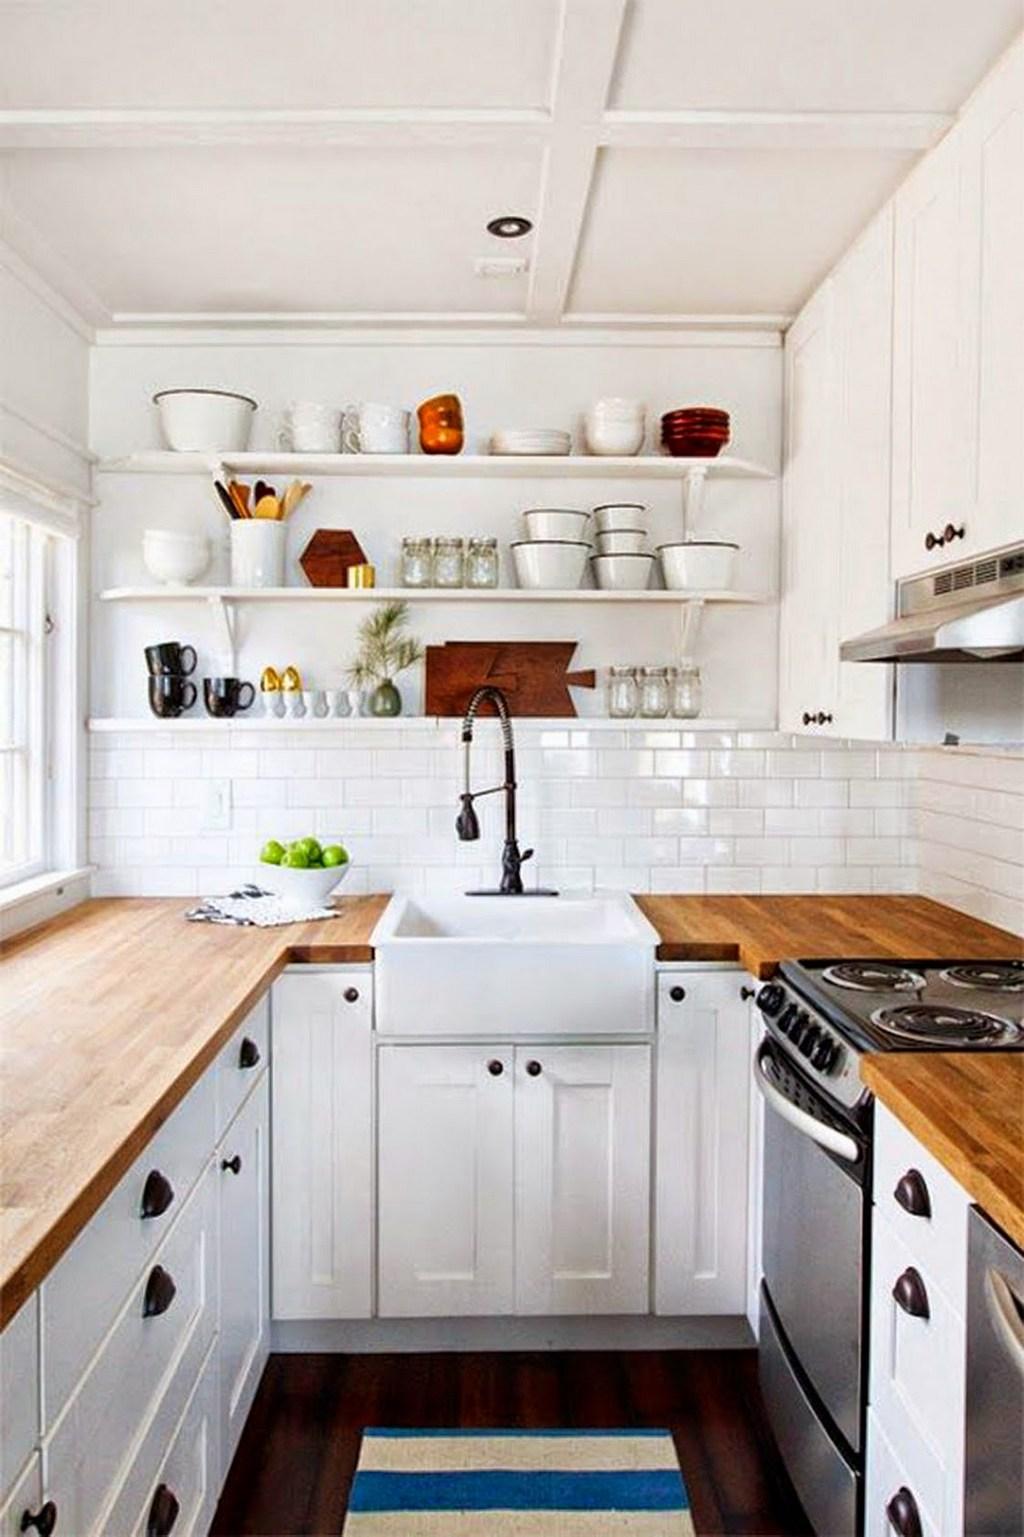 Оптимизируем пространство кухни